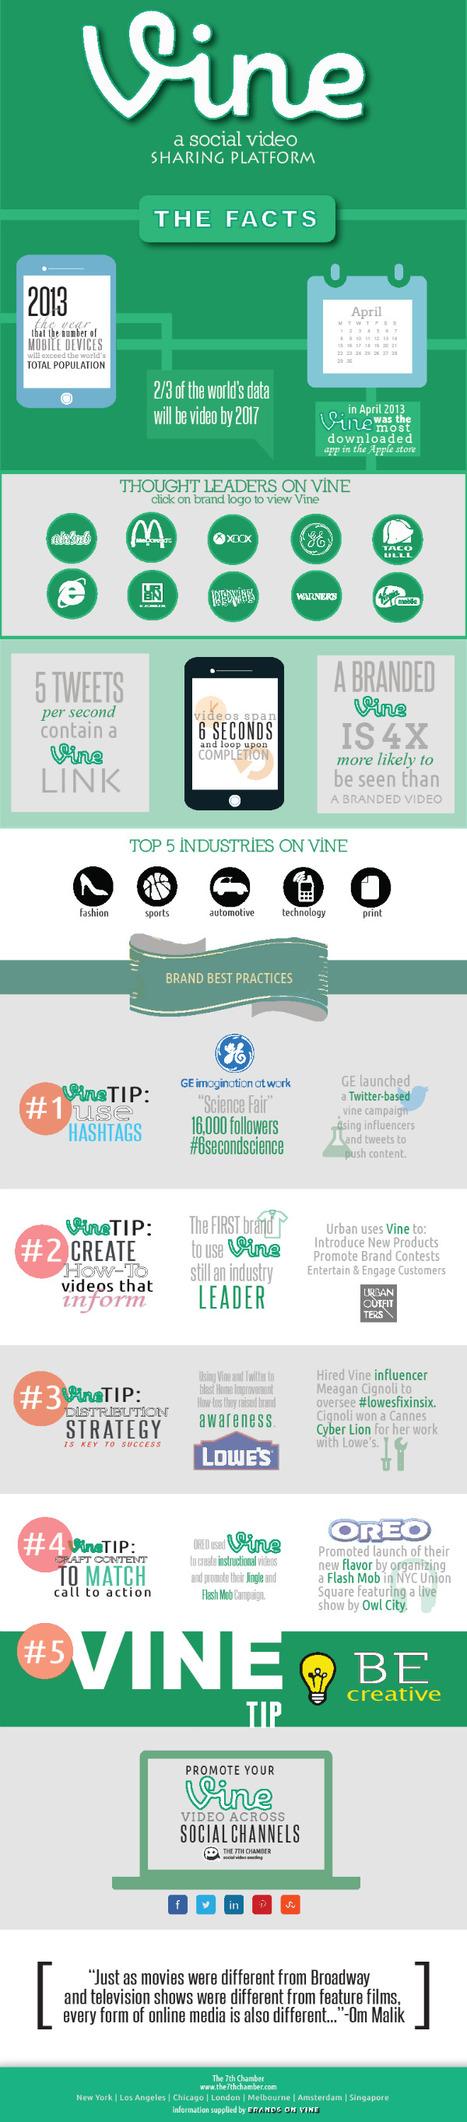 Vine Video Creation Tips {Infographic} - Best Infographics | Digital-News on Scoop.it today | Scoop.it